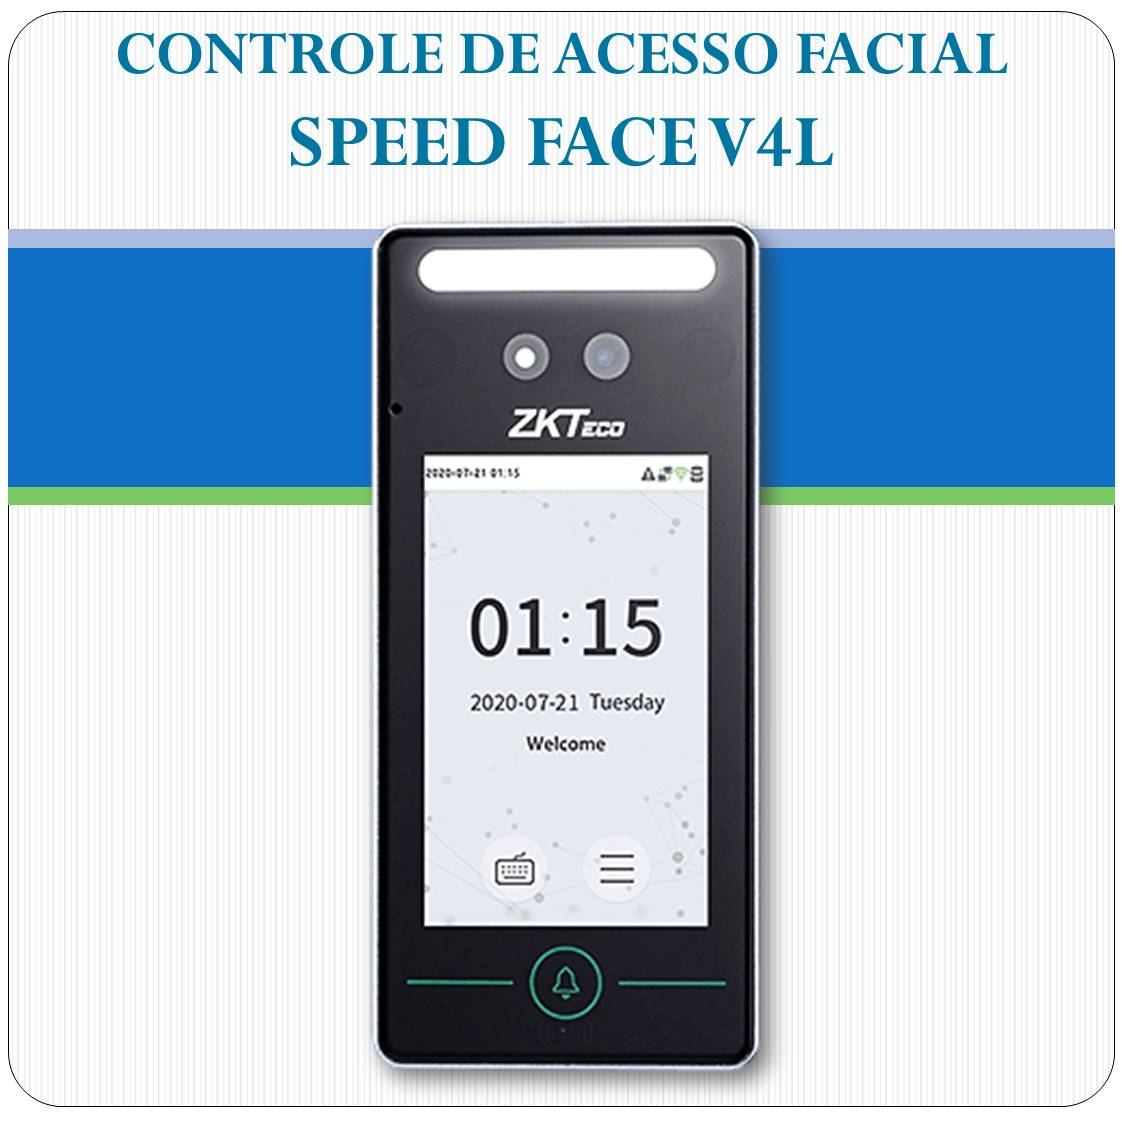 Controle de Acesso Facial - SpeedFace V4L